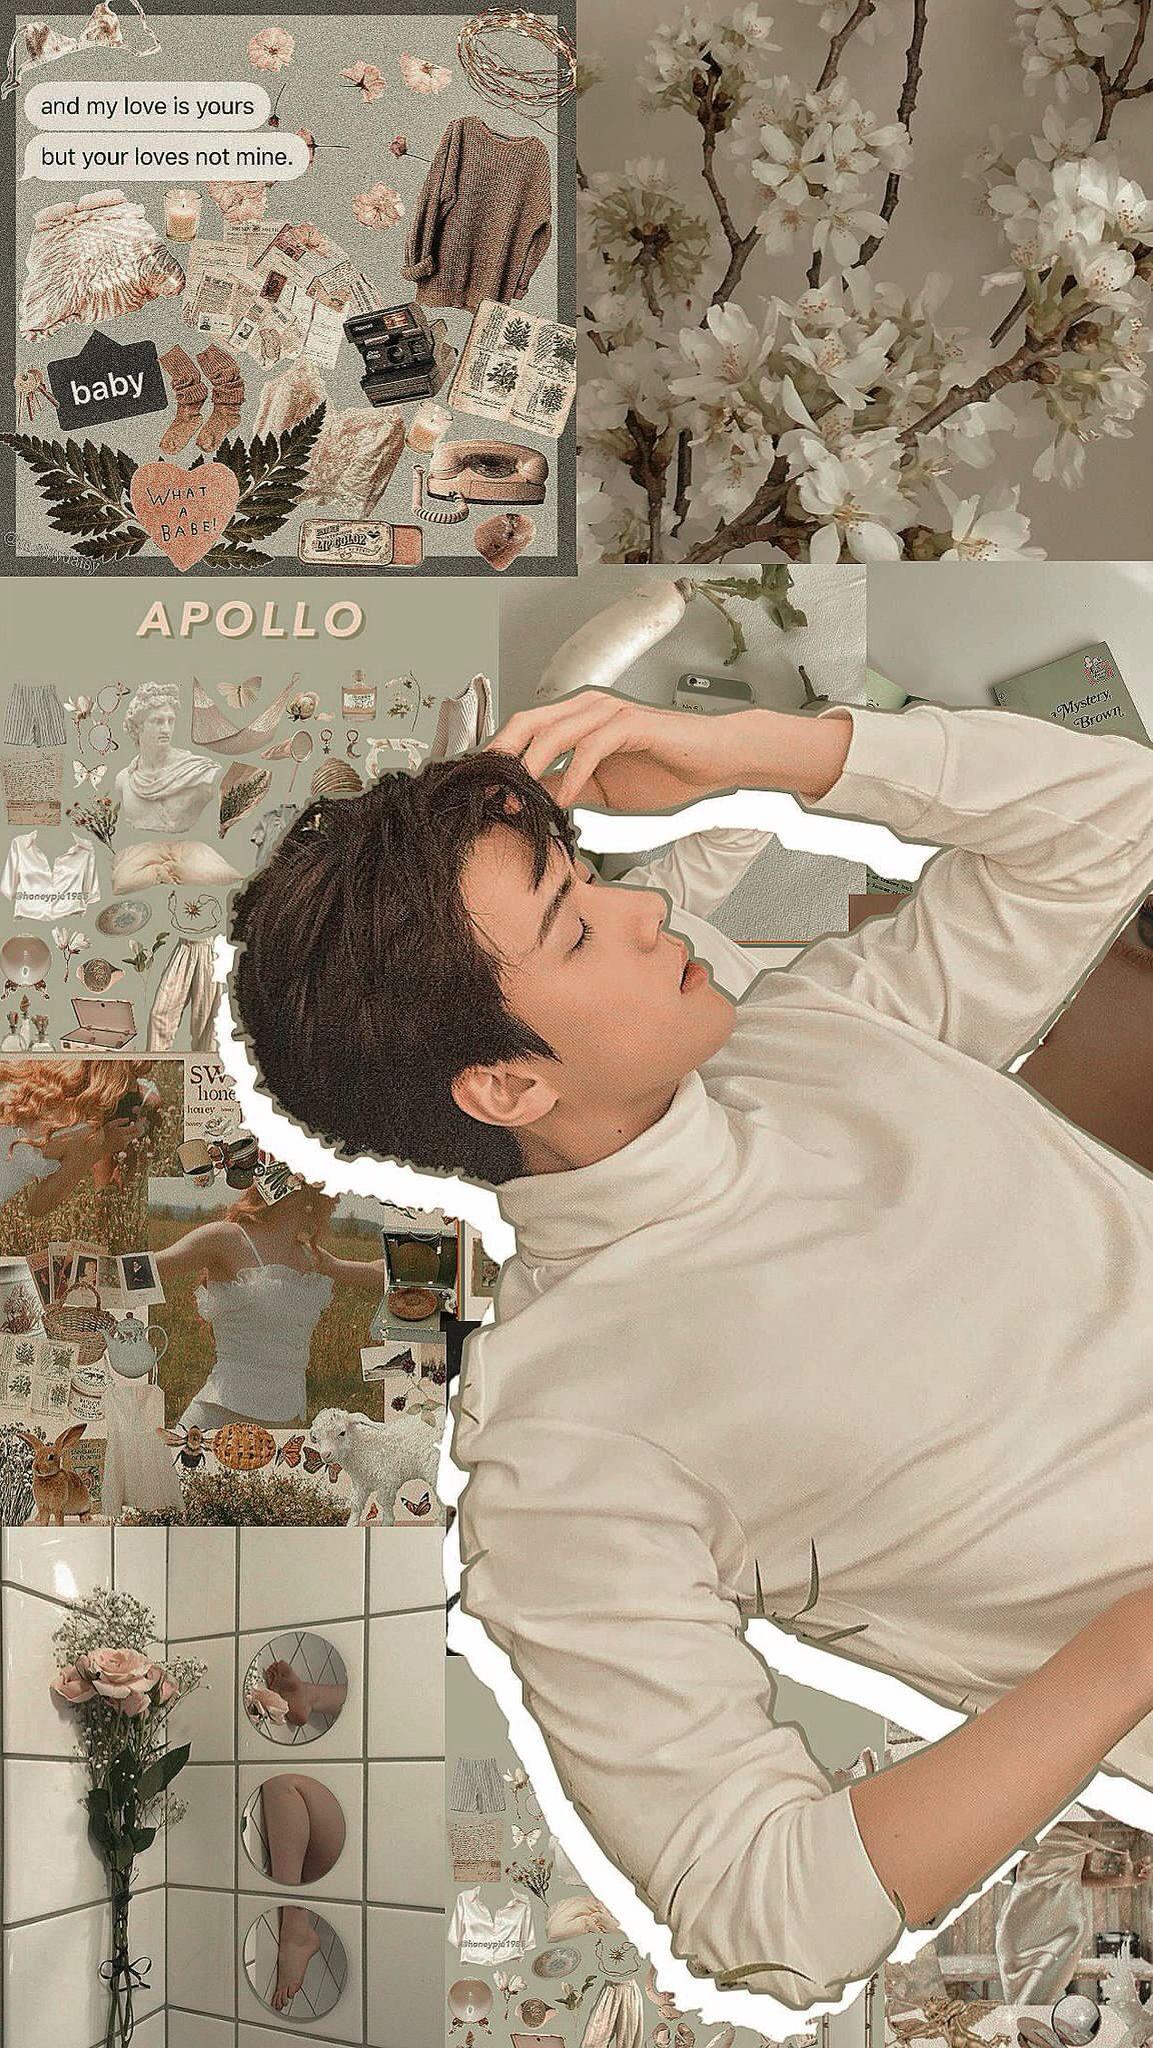 35+ Baekhyun Aesthetic Wallpaper Pinterest Pictures